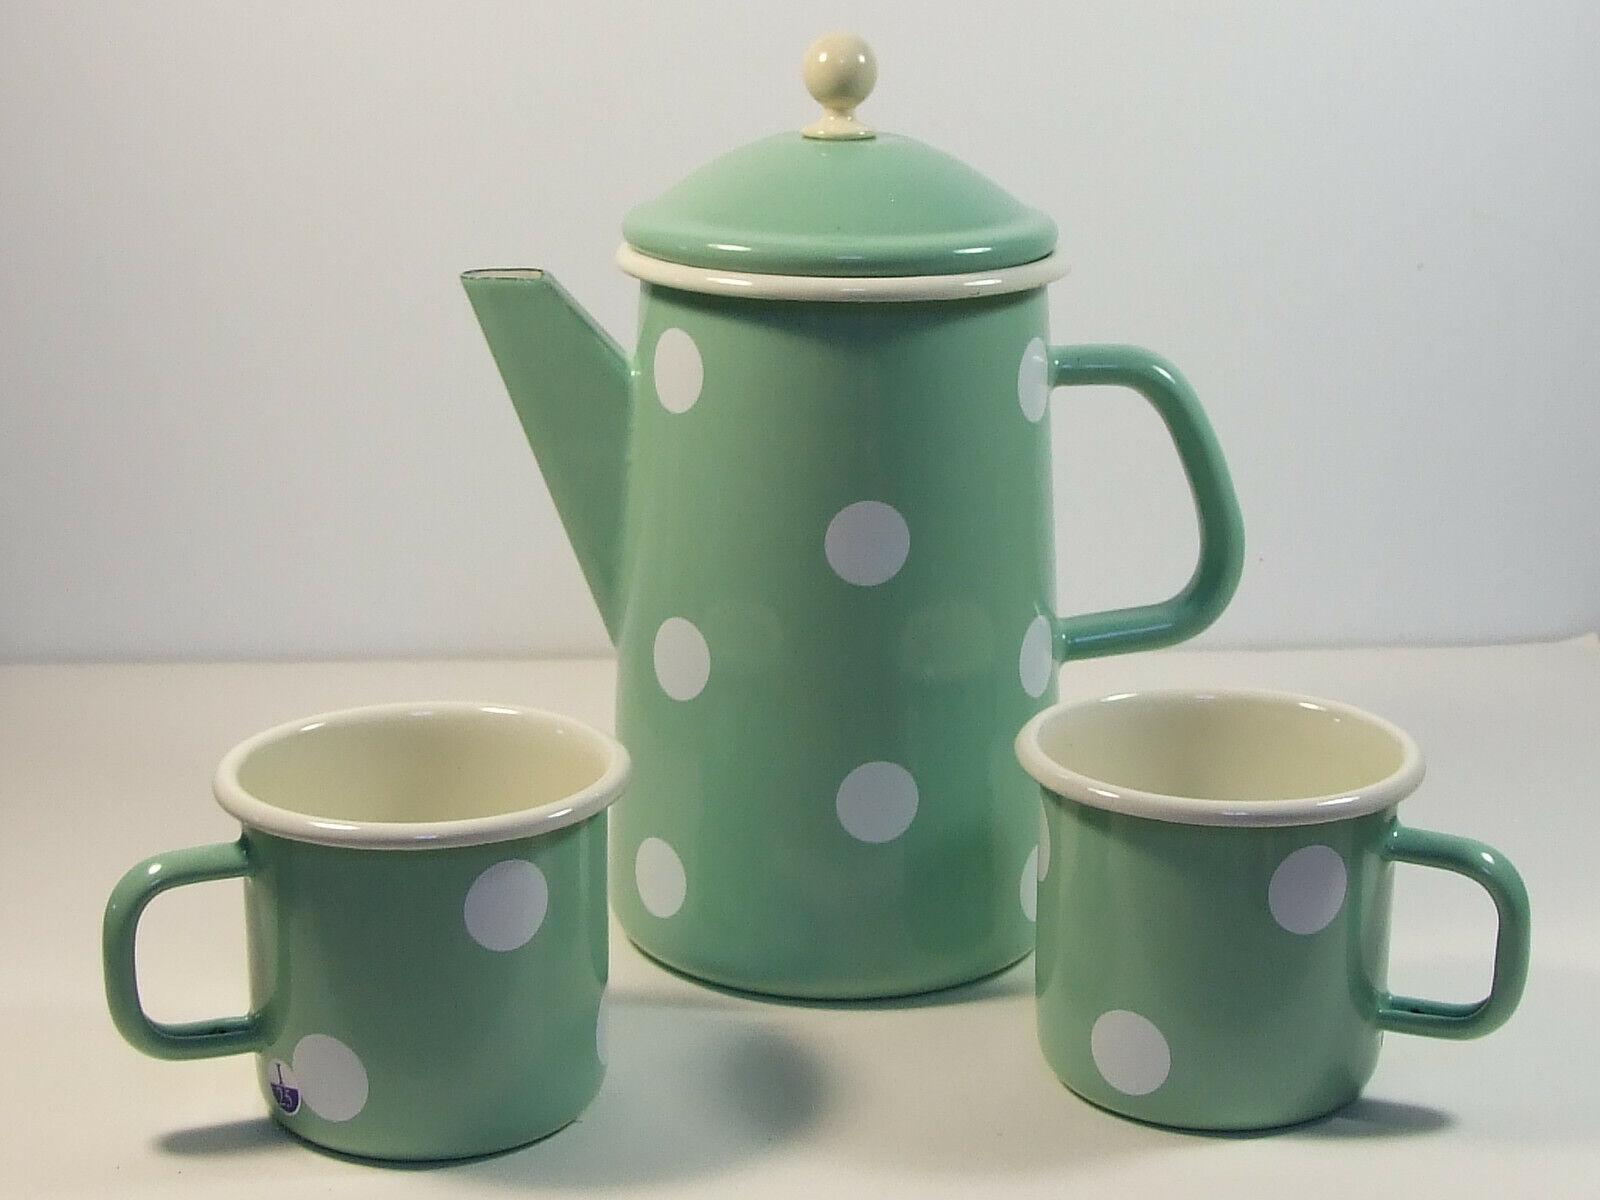 Email Enamel Coffee Pot Teapot 1,6 L and 2 Mugs MINT M. Polka Dot 3 Tlg Set